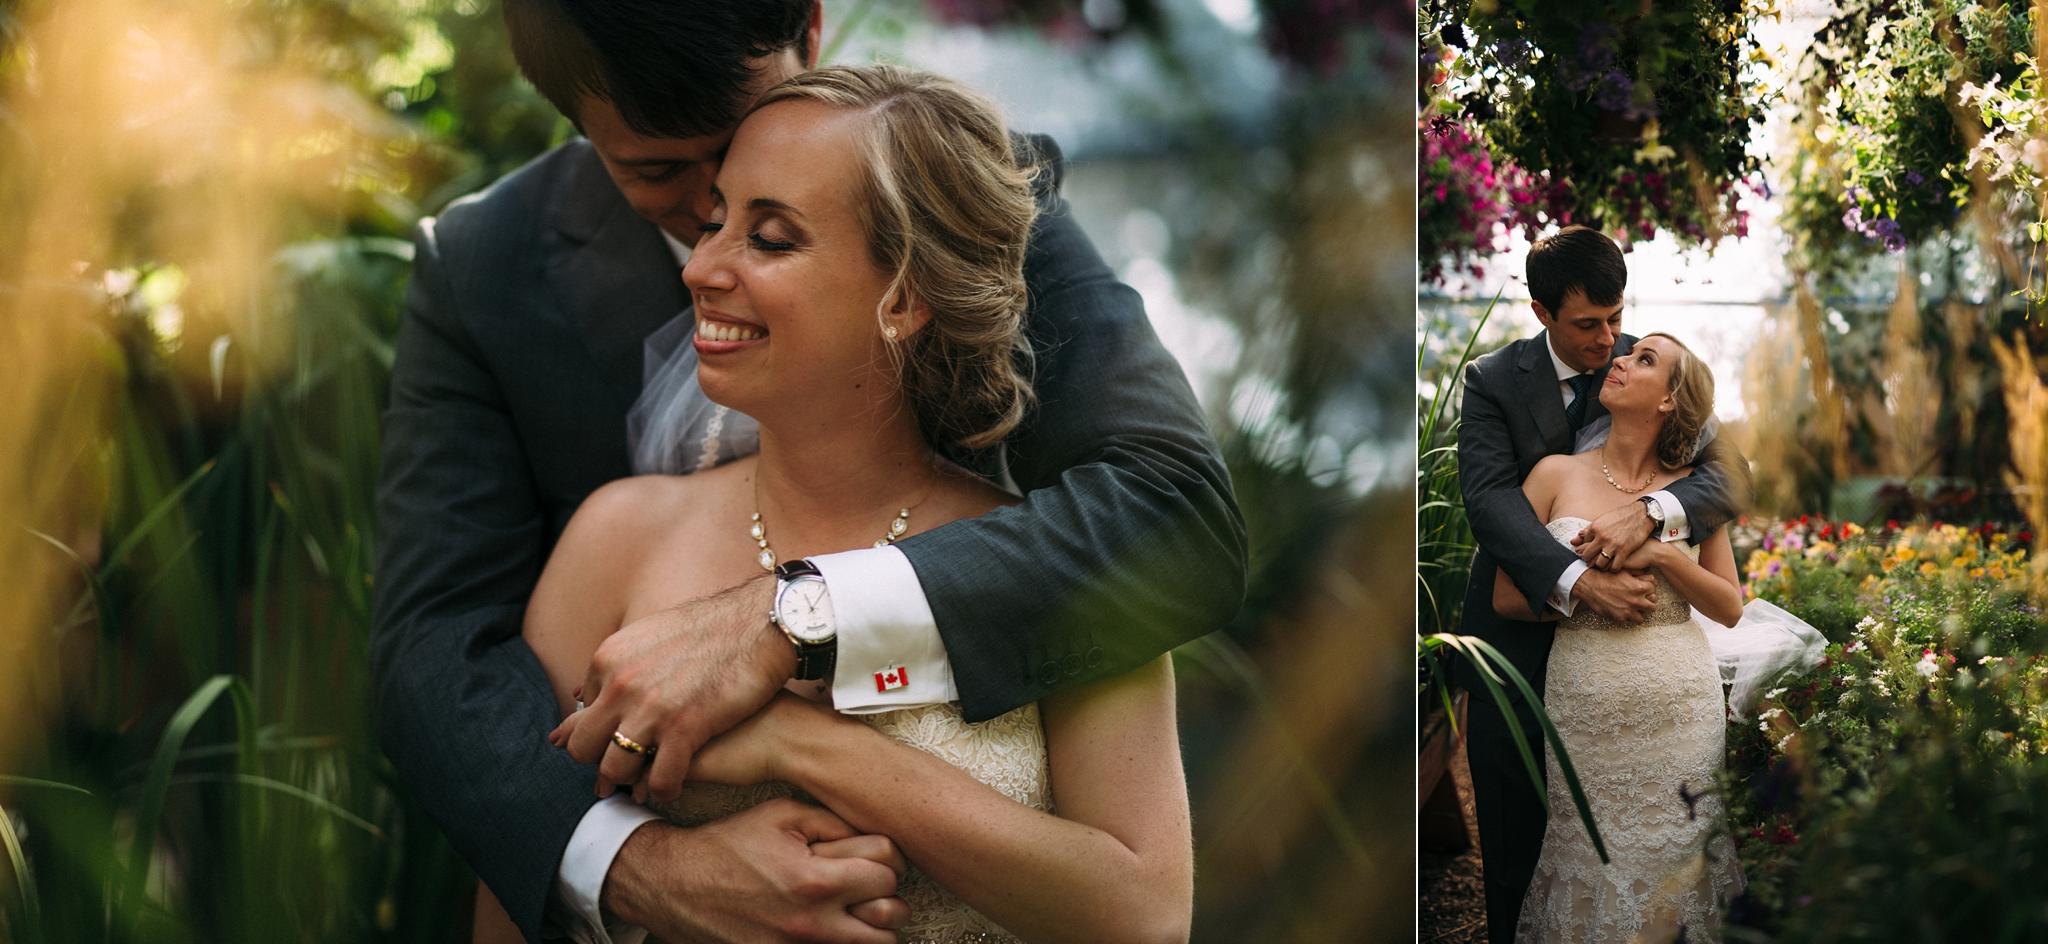 kaihla_tonai_intimate_wedding_elopement_photographer_4337